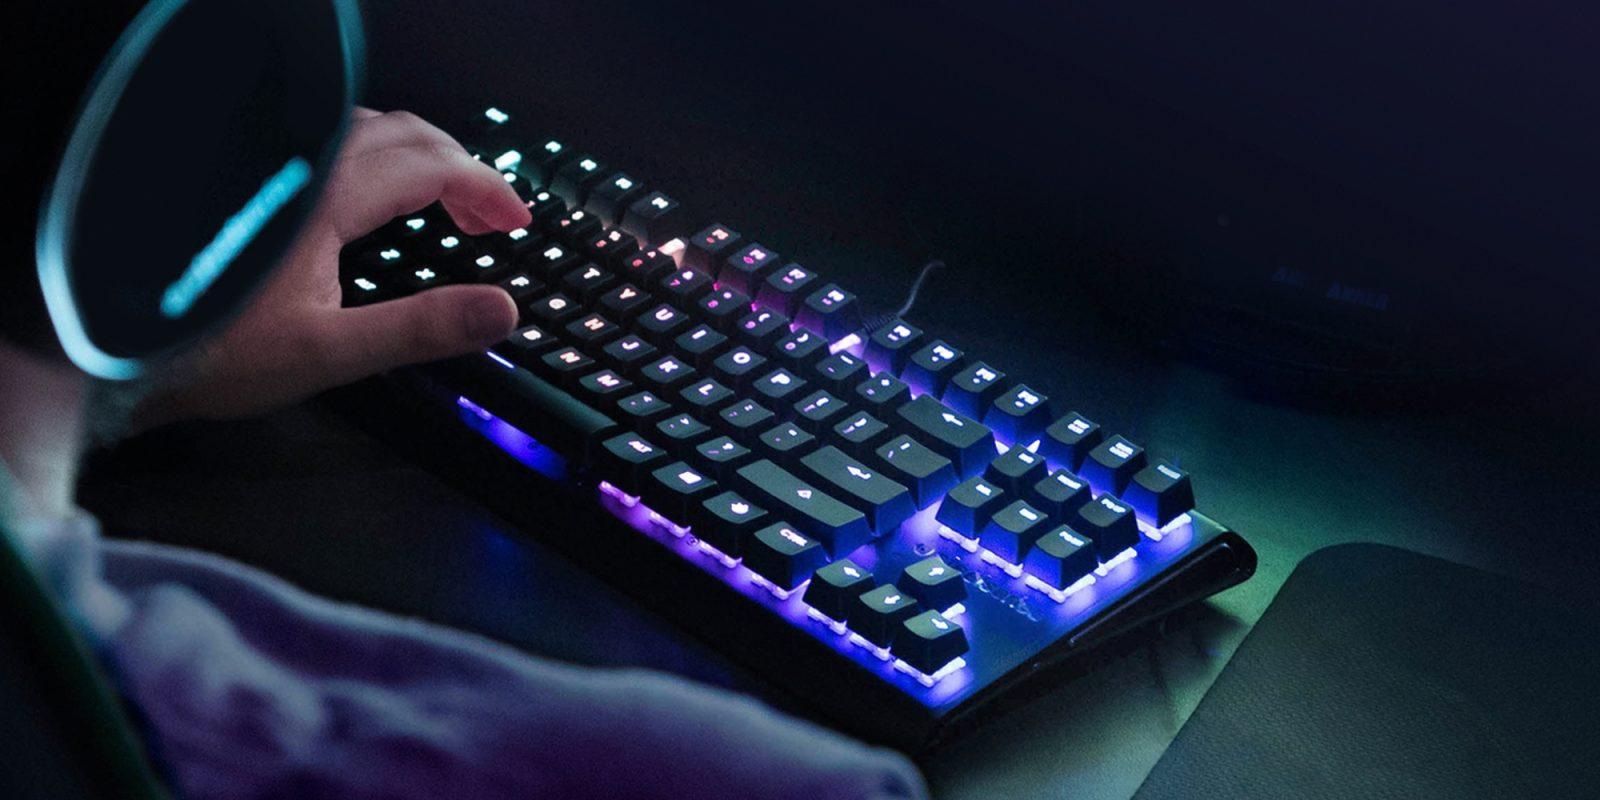 e1120b913e4 SteelSeries Apex RGB Mechanical Keyboard falls to a new low $89 (Reg.  $120), more